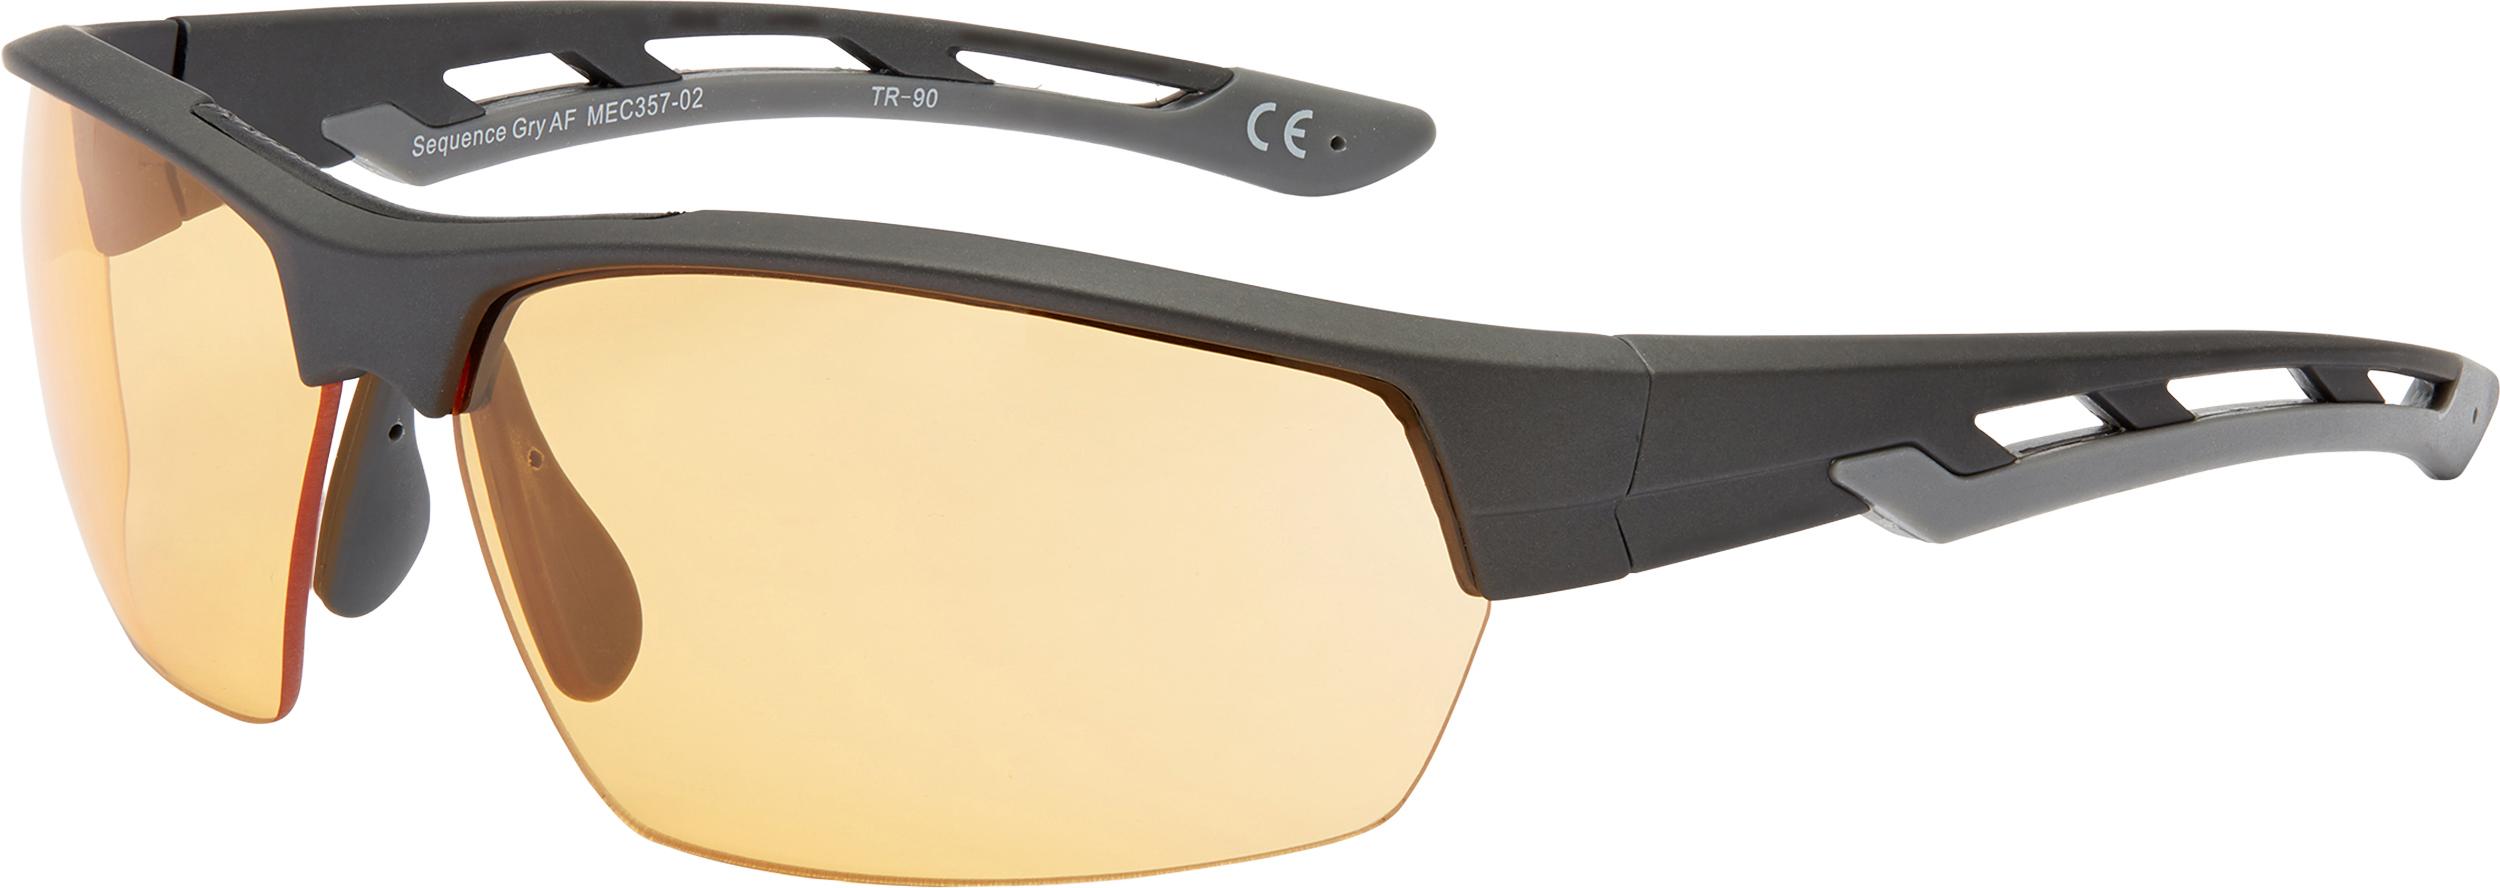 ce30fc828e67 Cycling sunglasses | MEC